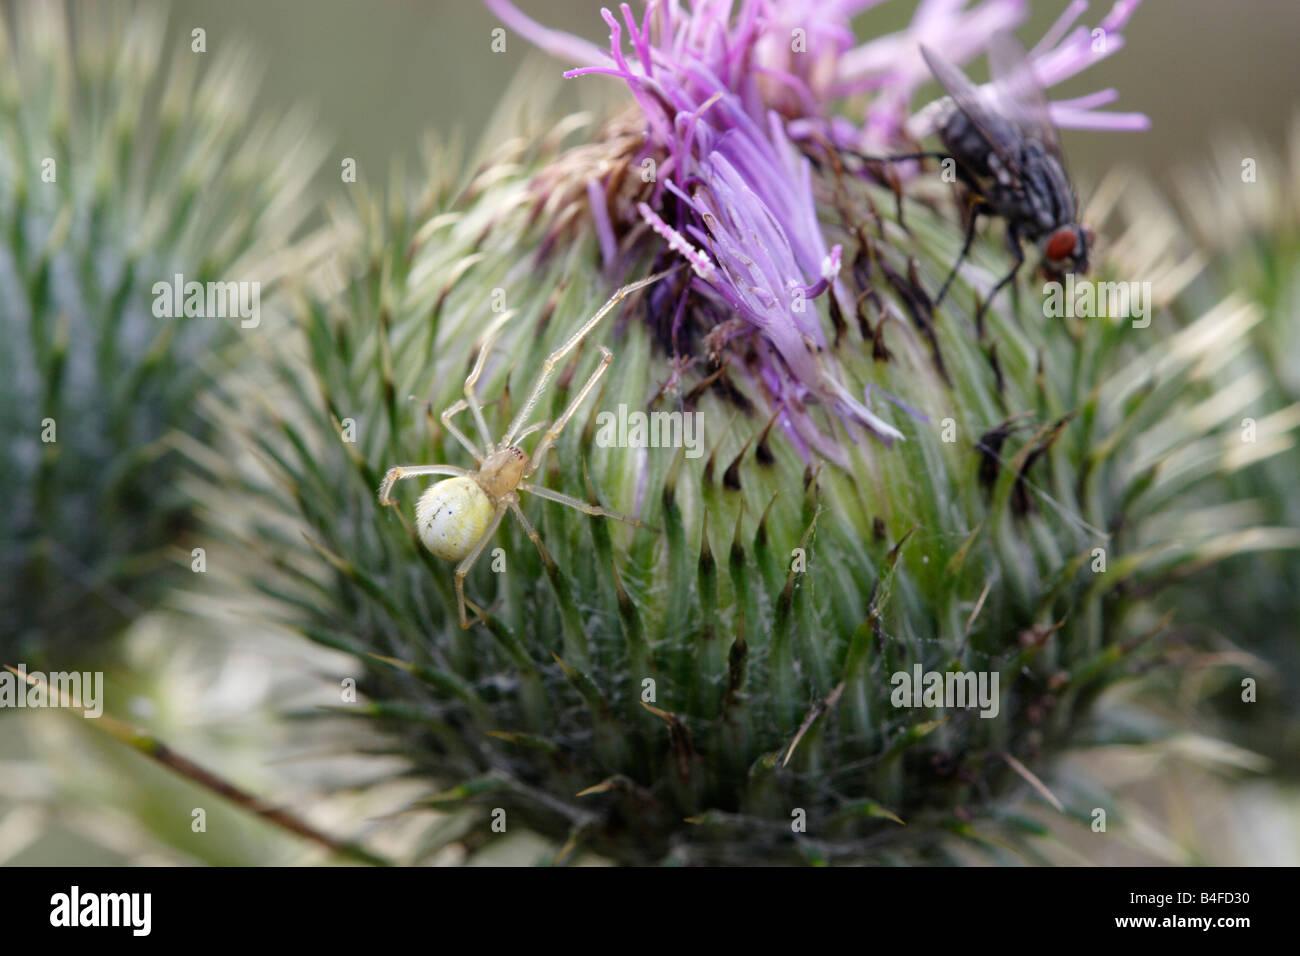 Spider (Enoplognatha ovata) hunts flesh fly (Sarcophaga carnaria) - Stock Image